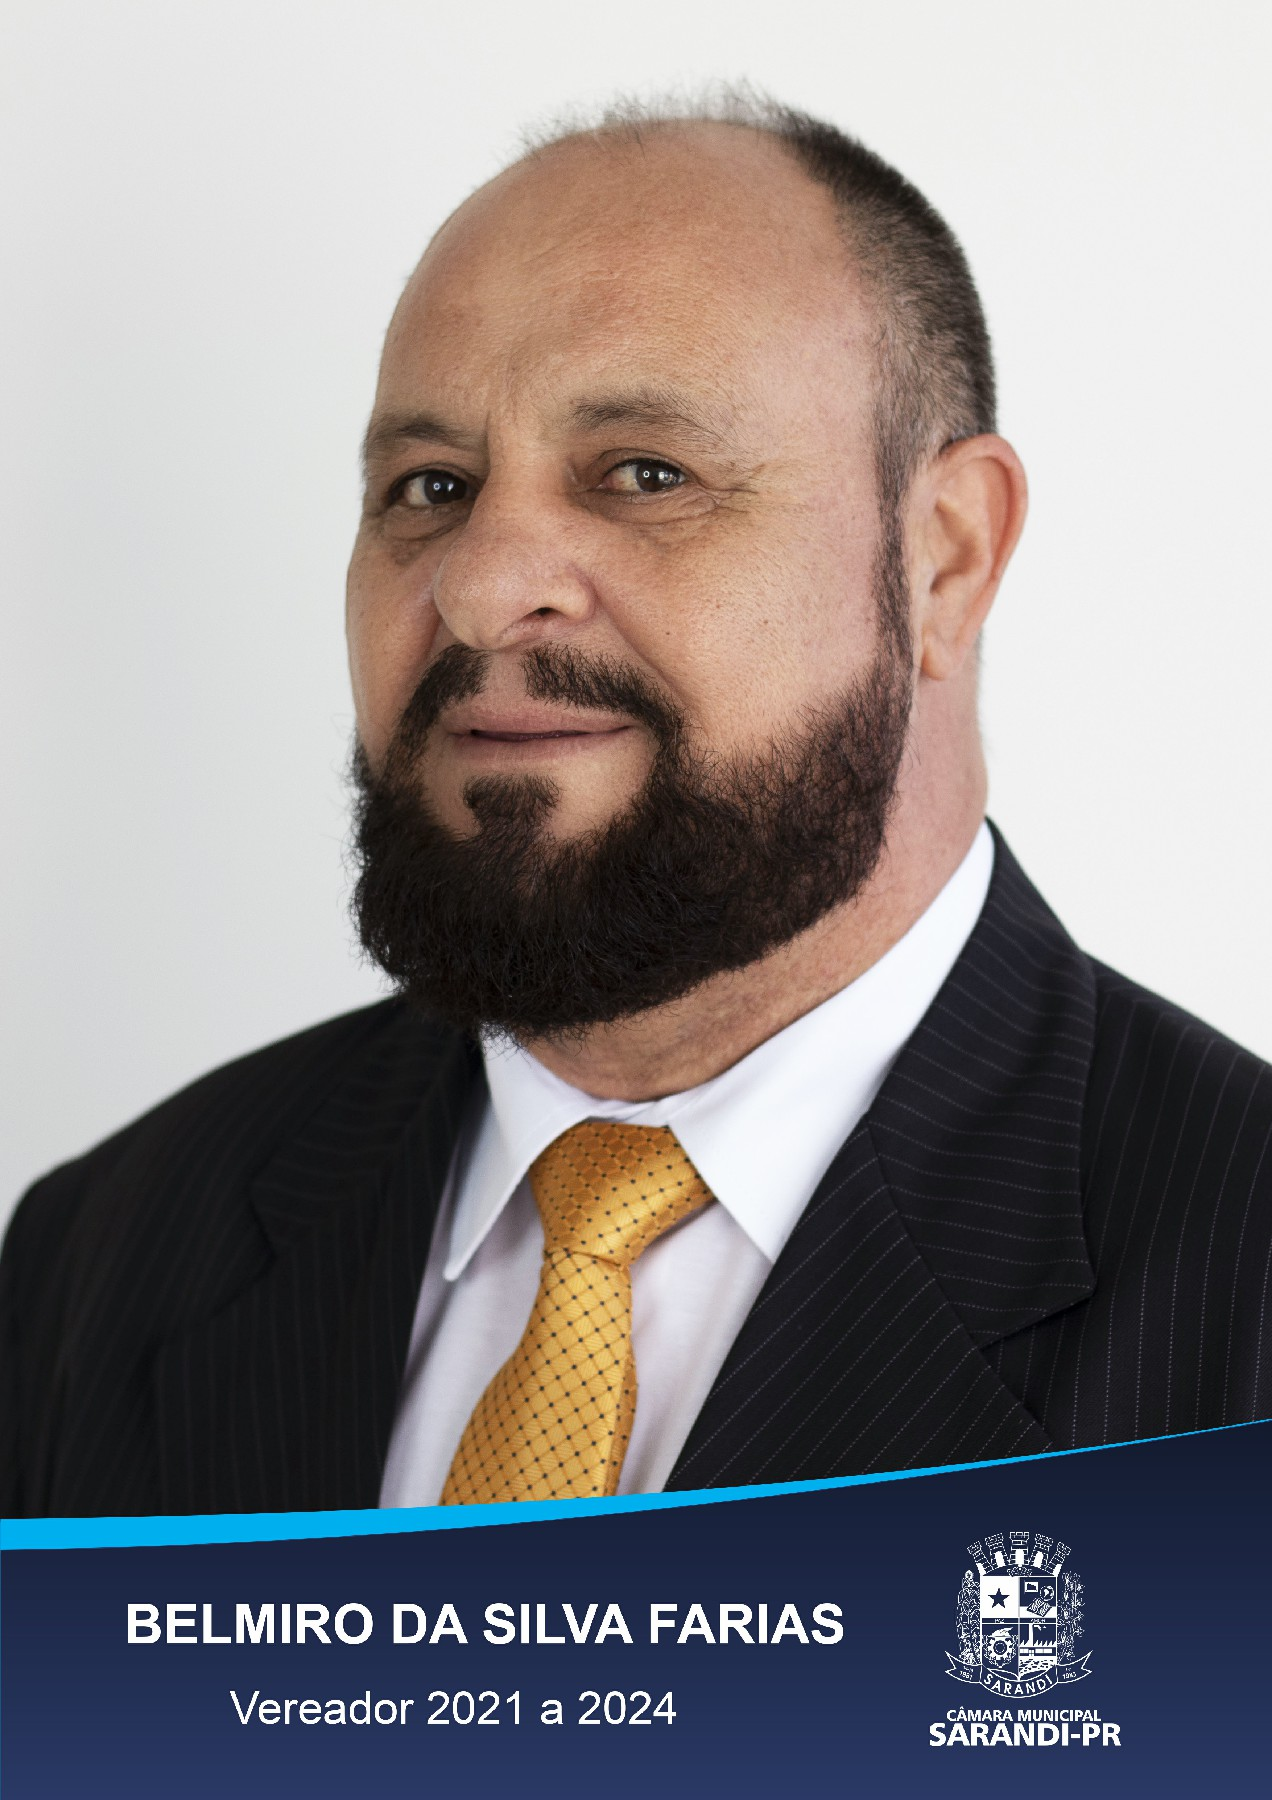 Belmiro da Silva Farias - Belmiro Barbeiro